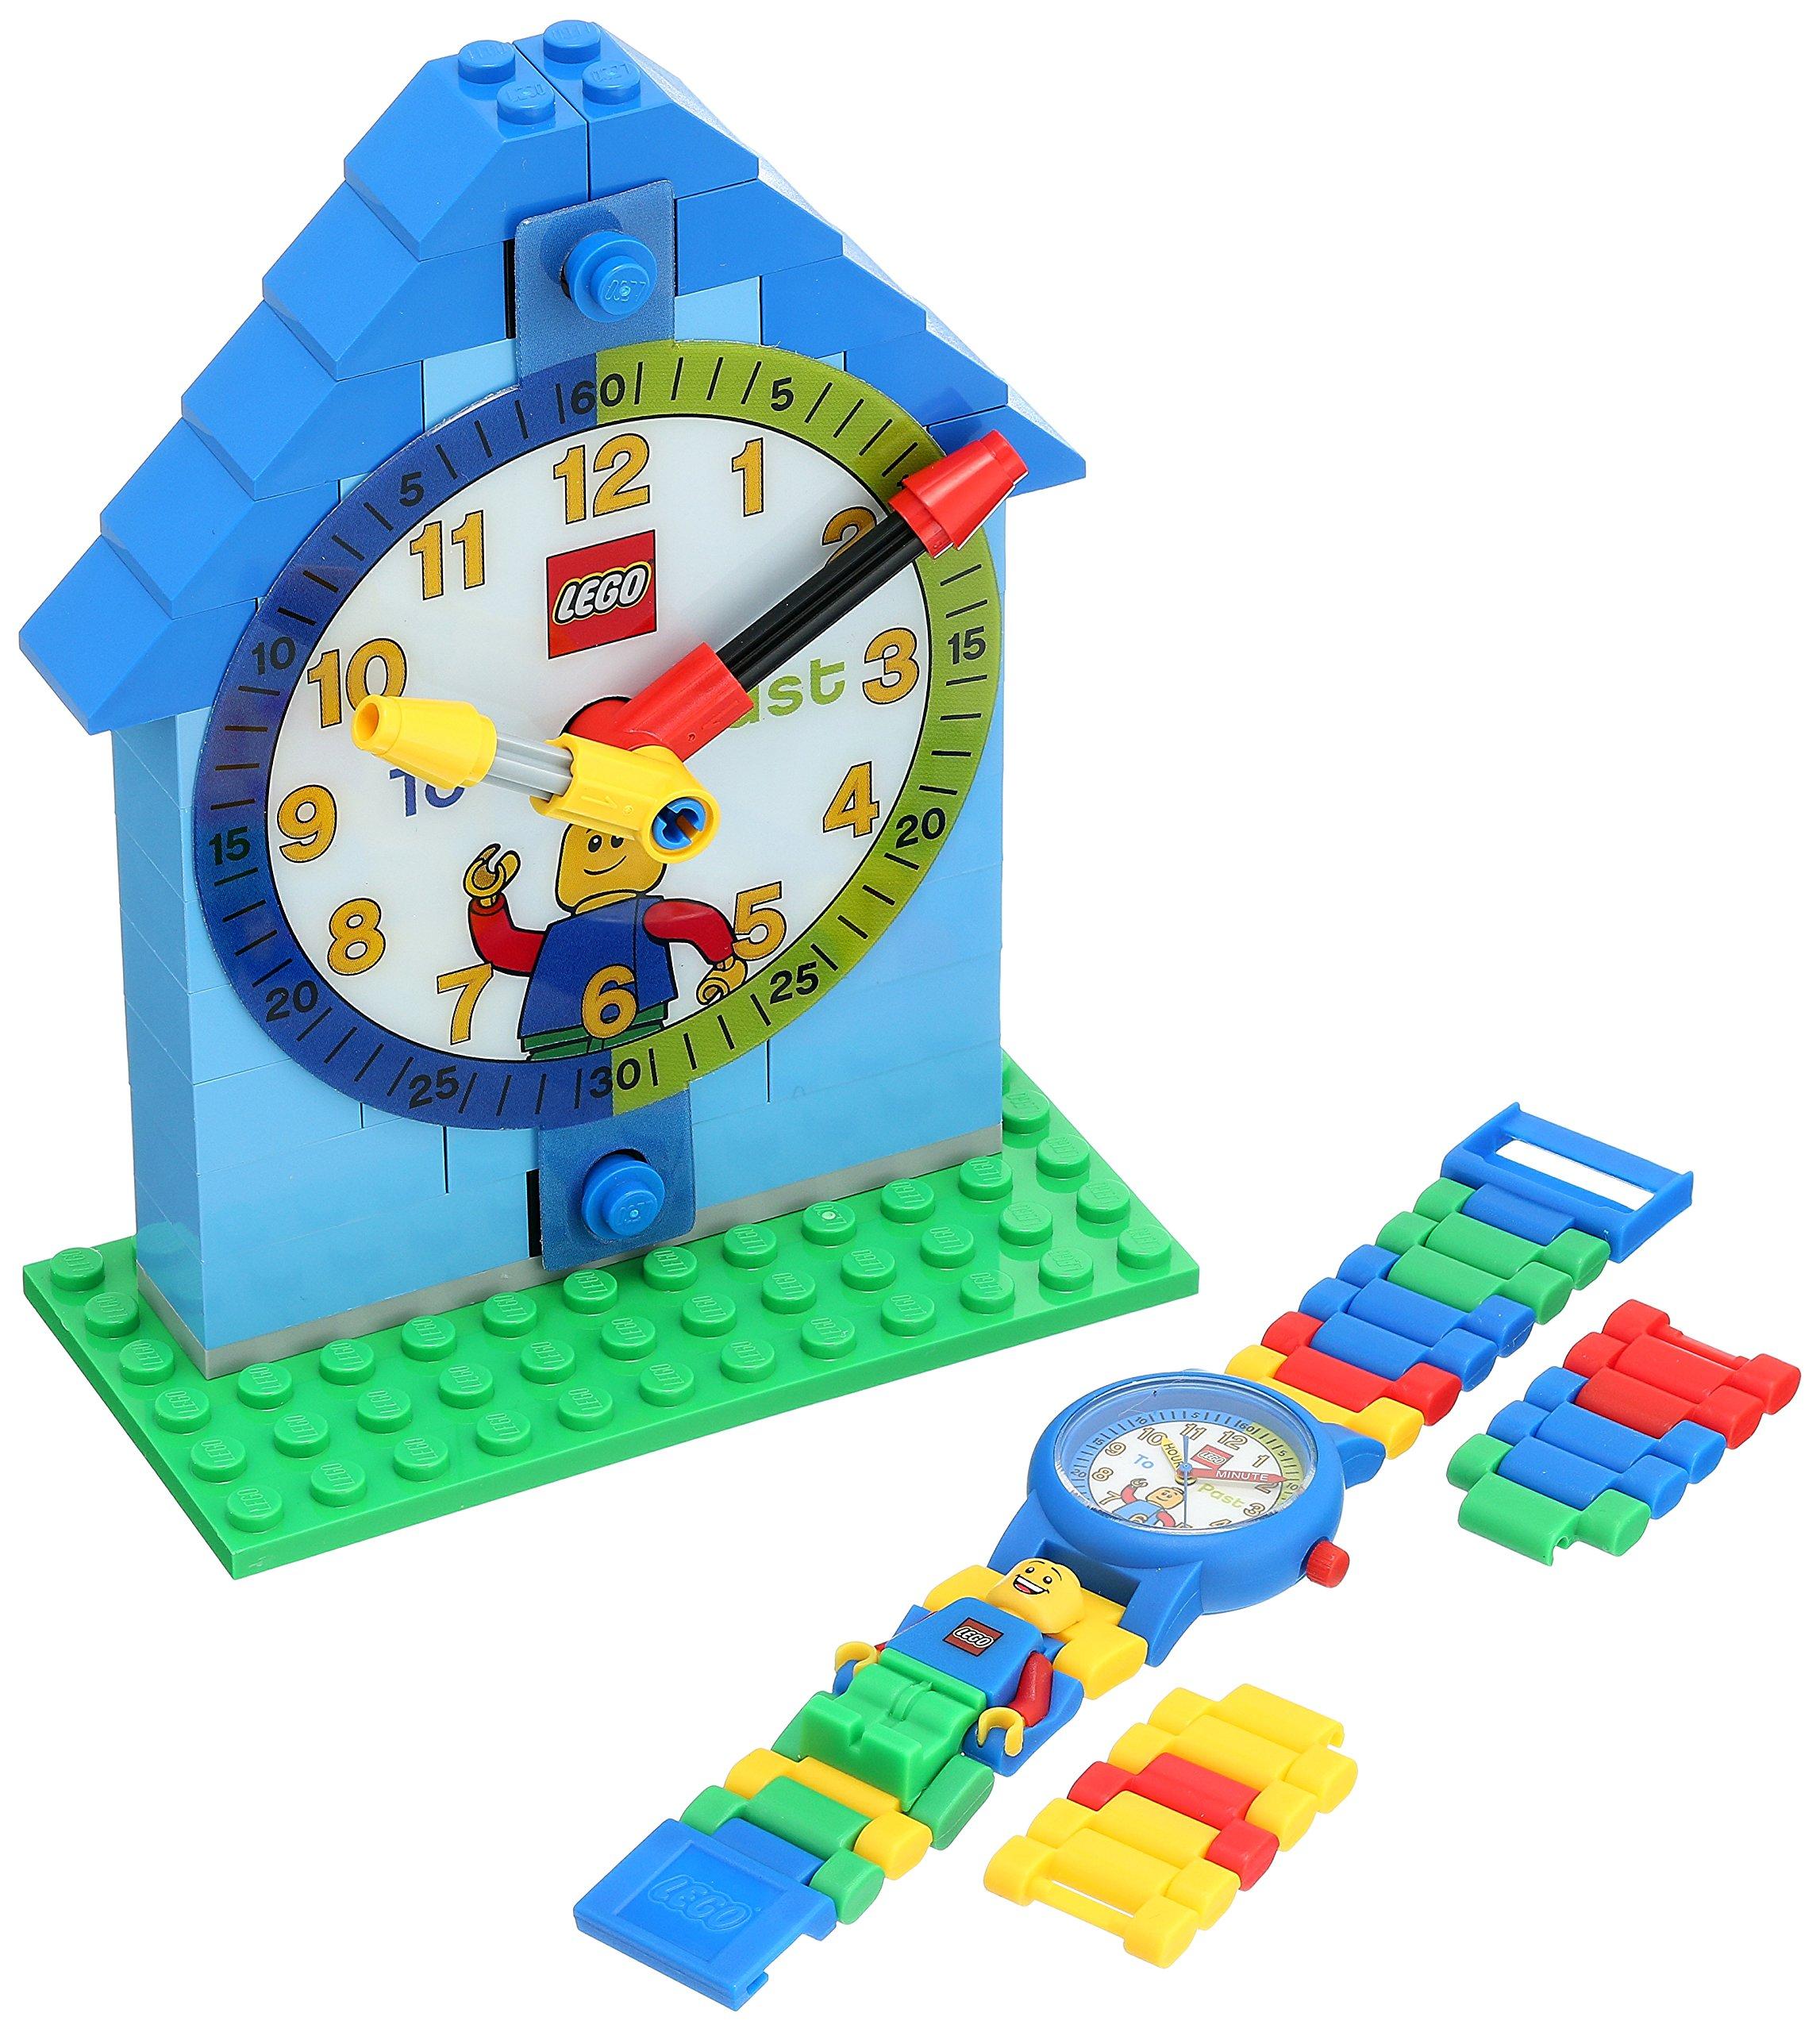 LEGO Time Teacher 9005008 Blue Kids Minifigure Link Buildable Watch, Constructible Clock and Activity Cards | blue/green | plastic | 25mm case diameter| analog quartz | boy girl | official